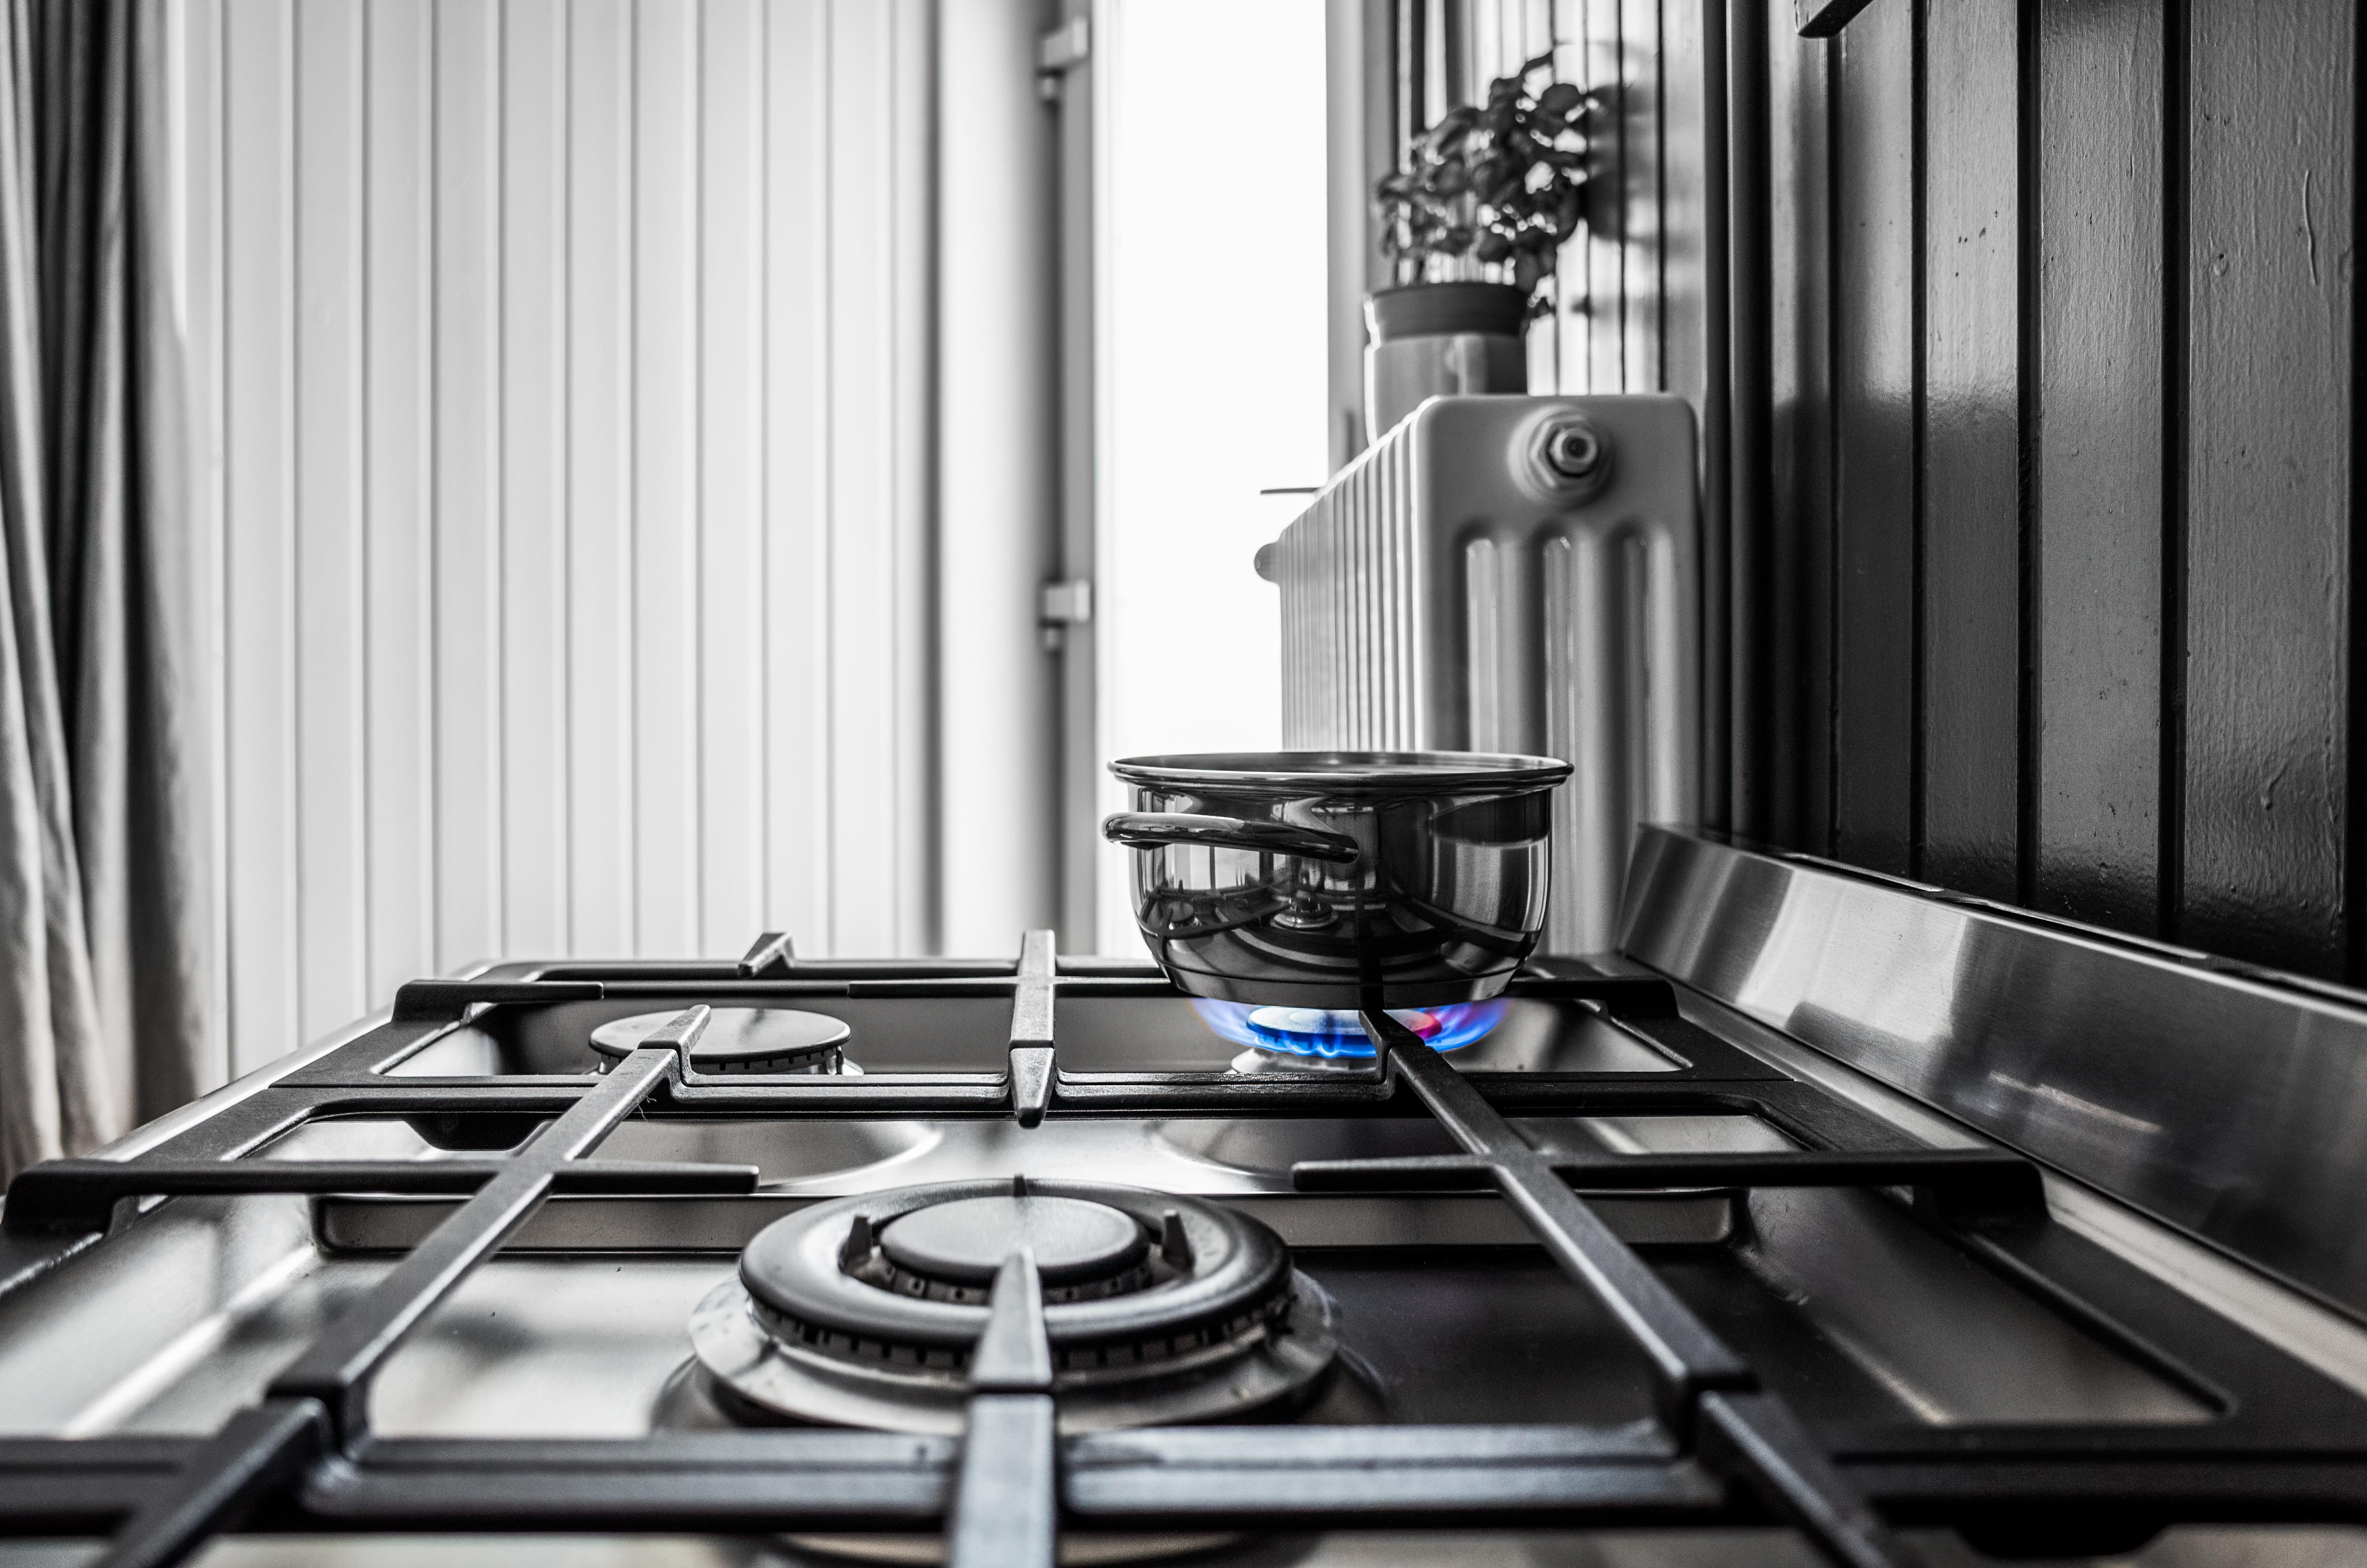 small-metal-pan-stove-kitchen.jpg